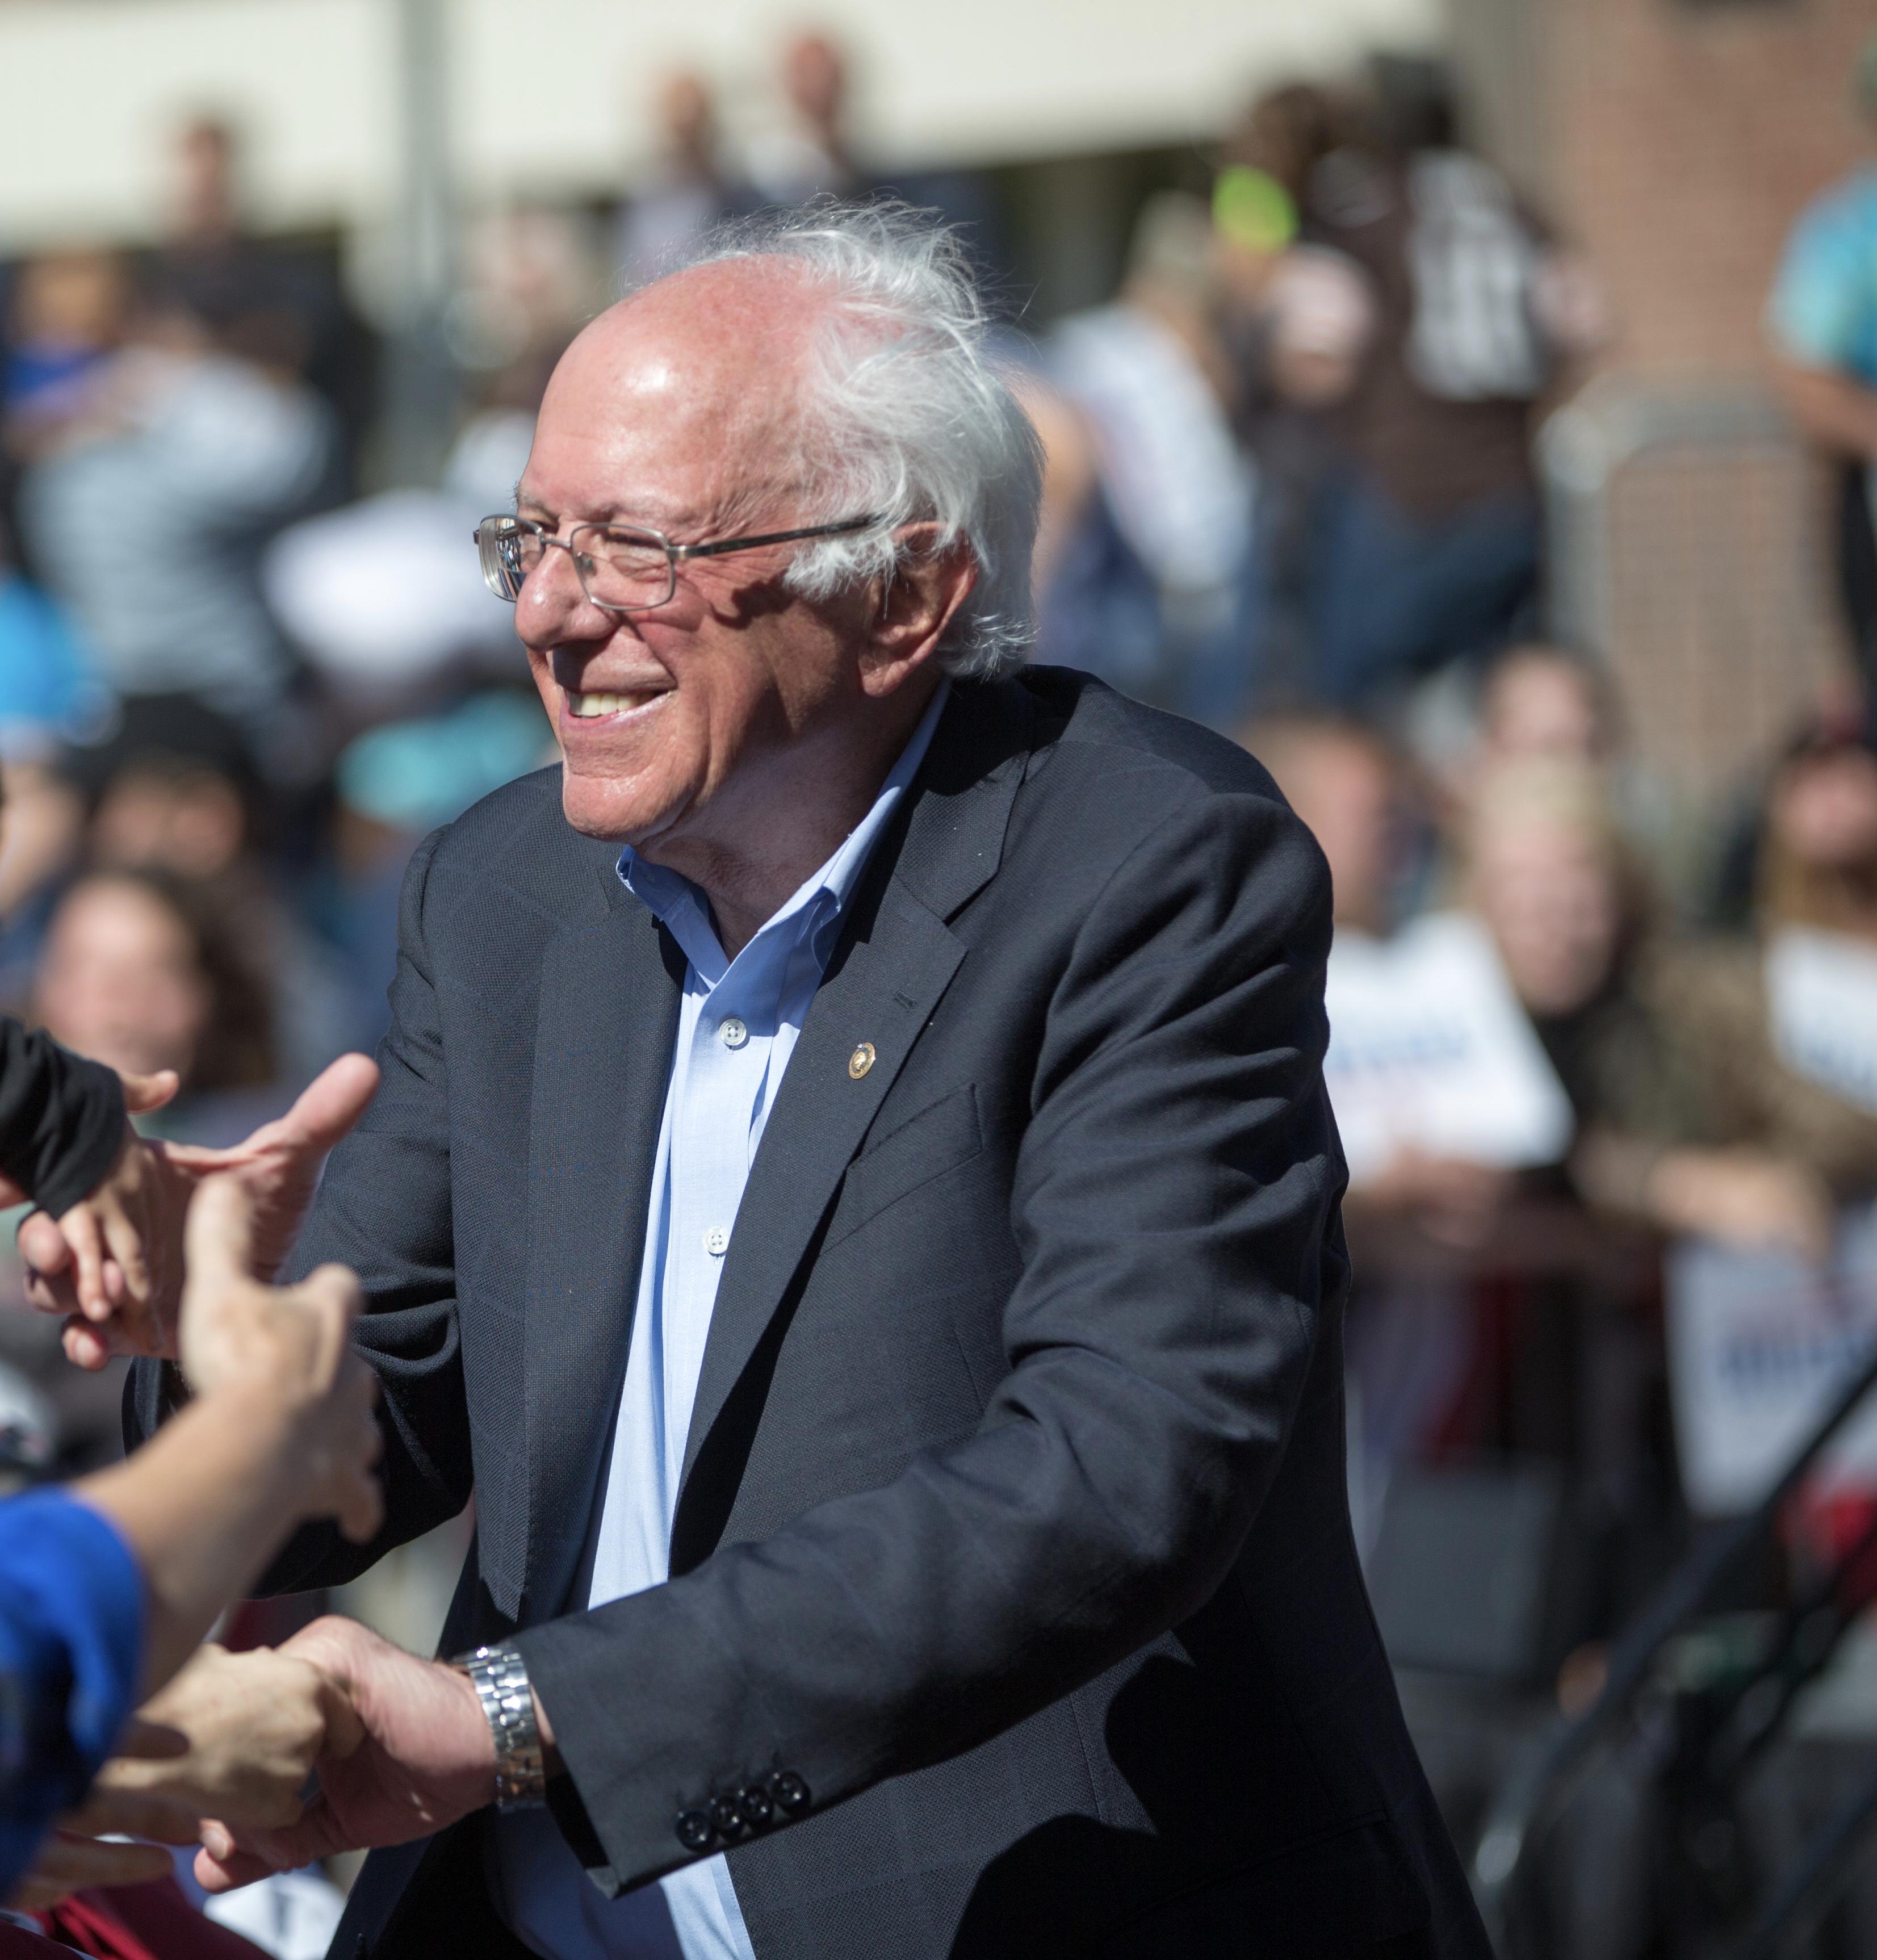 Bernie Sanders Suffers Heart Attack